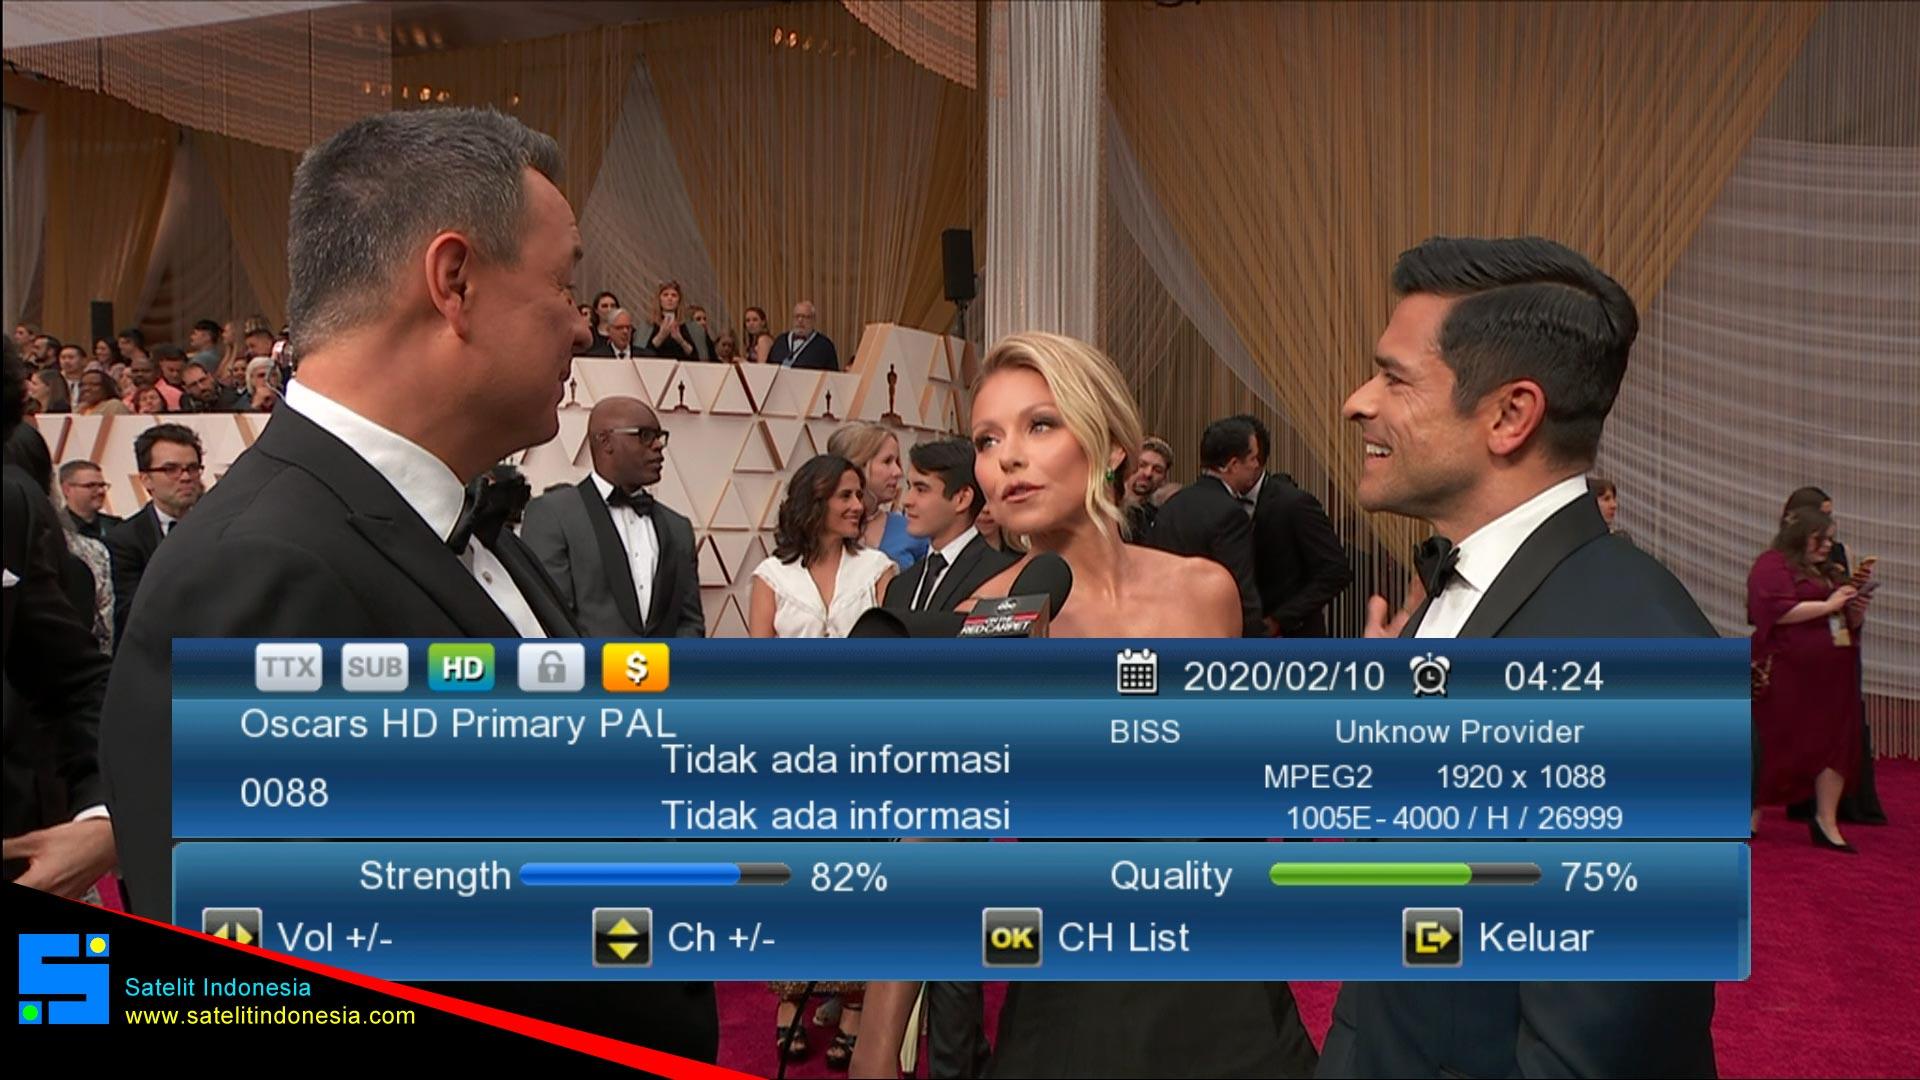 Frekuensi siaran Oscars HD Primary PAL di satelit  Terbaru